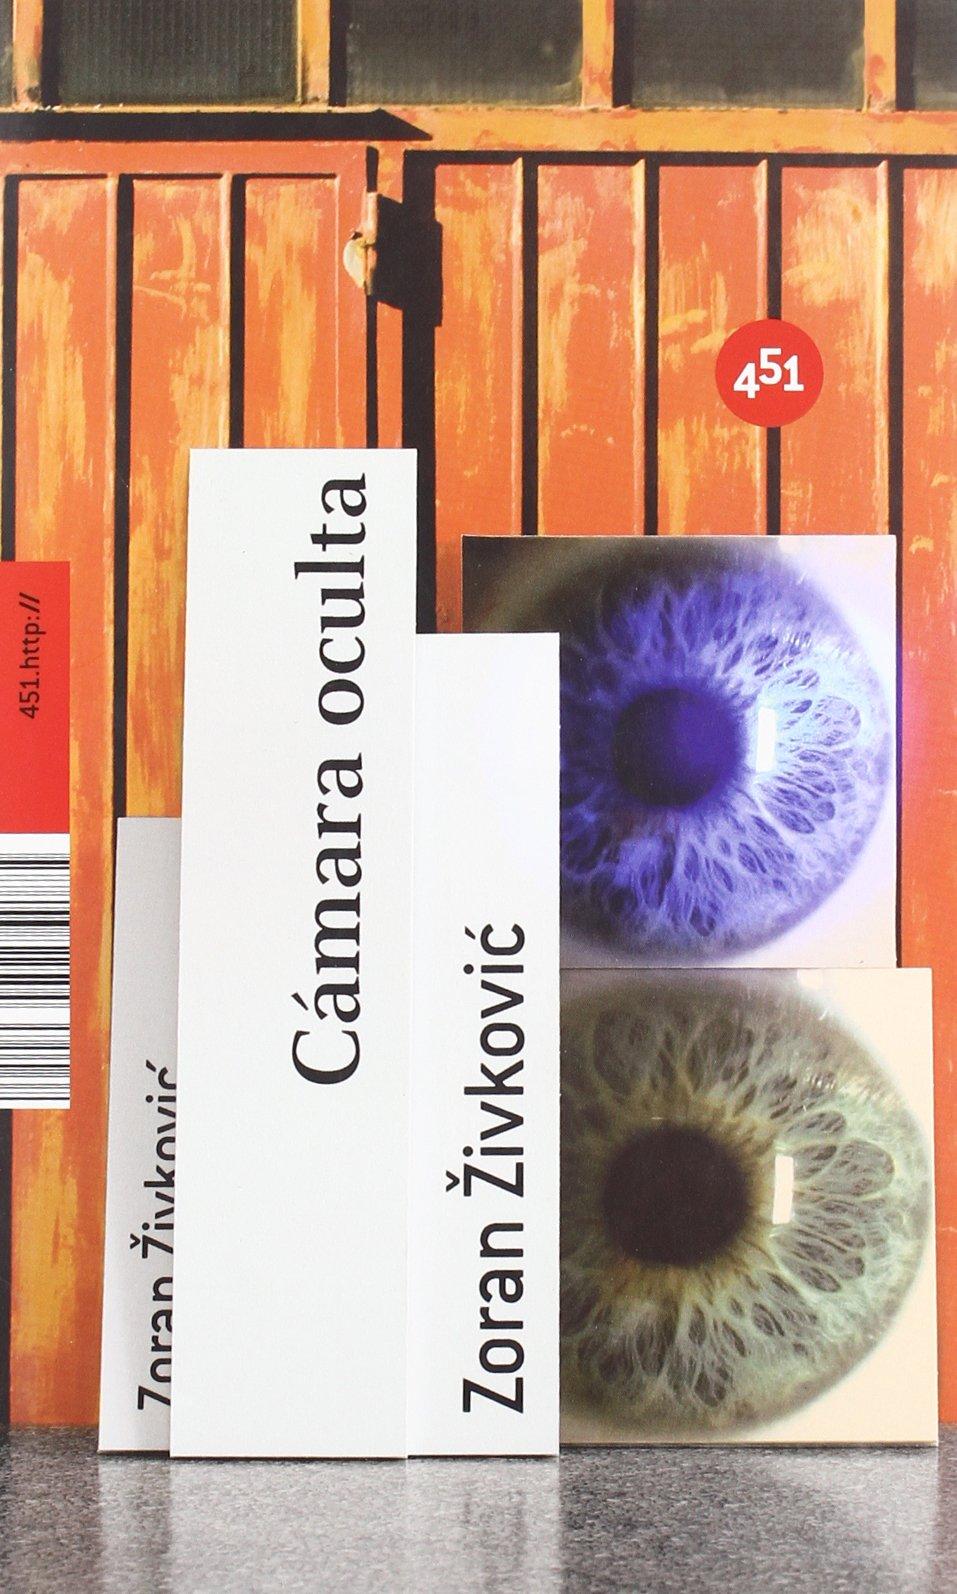 Camara oculta (451.http://) (Spanish Edition) (Spanish) Paperback – January 5, 2009